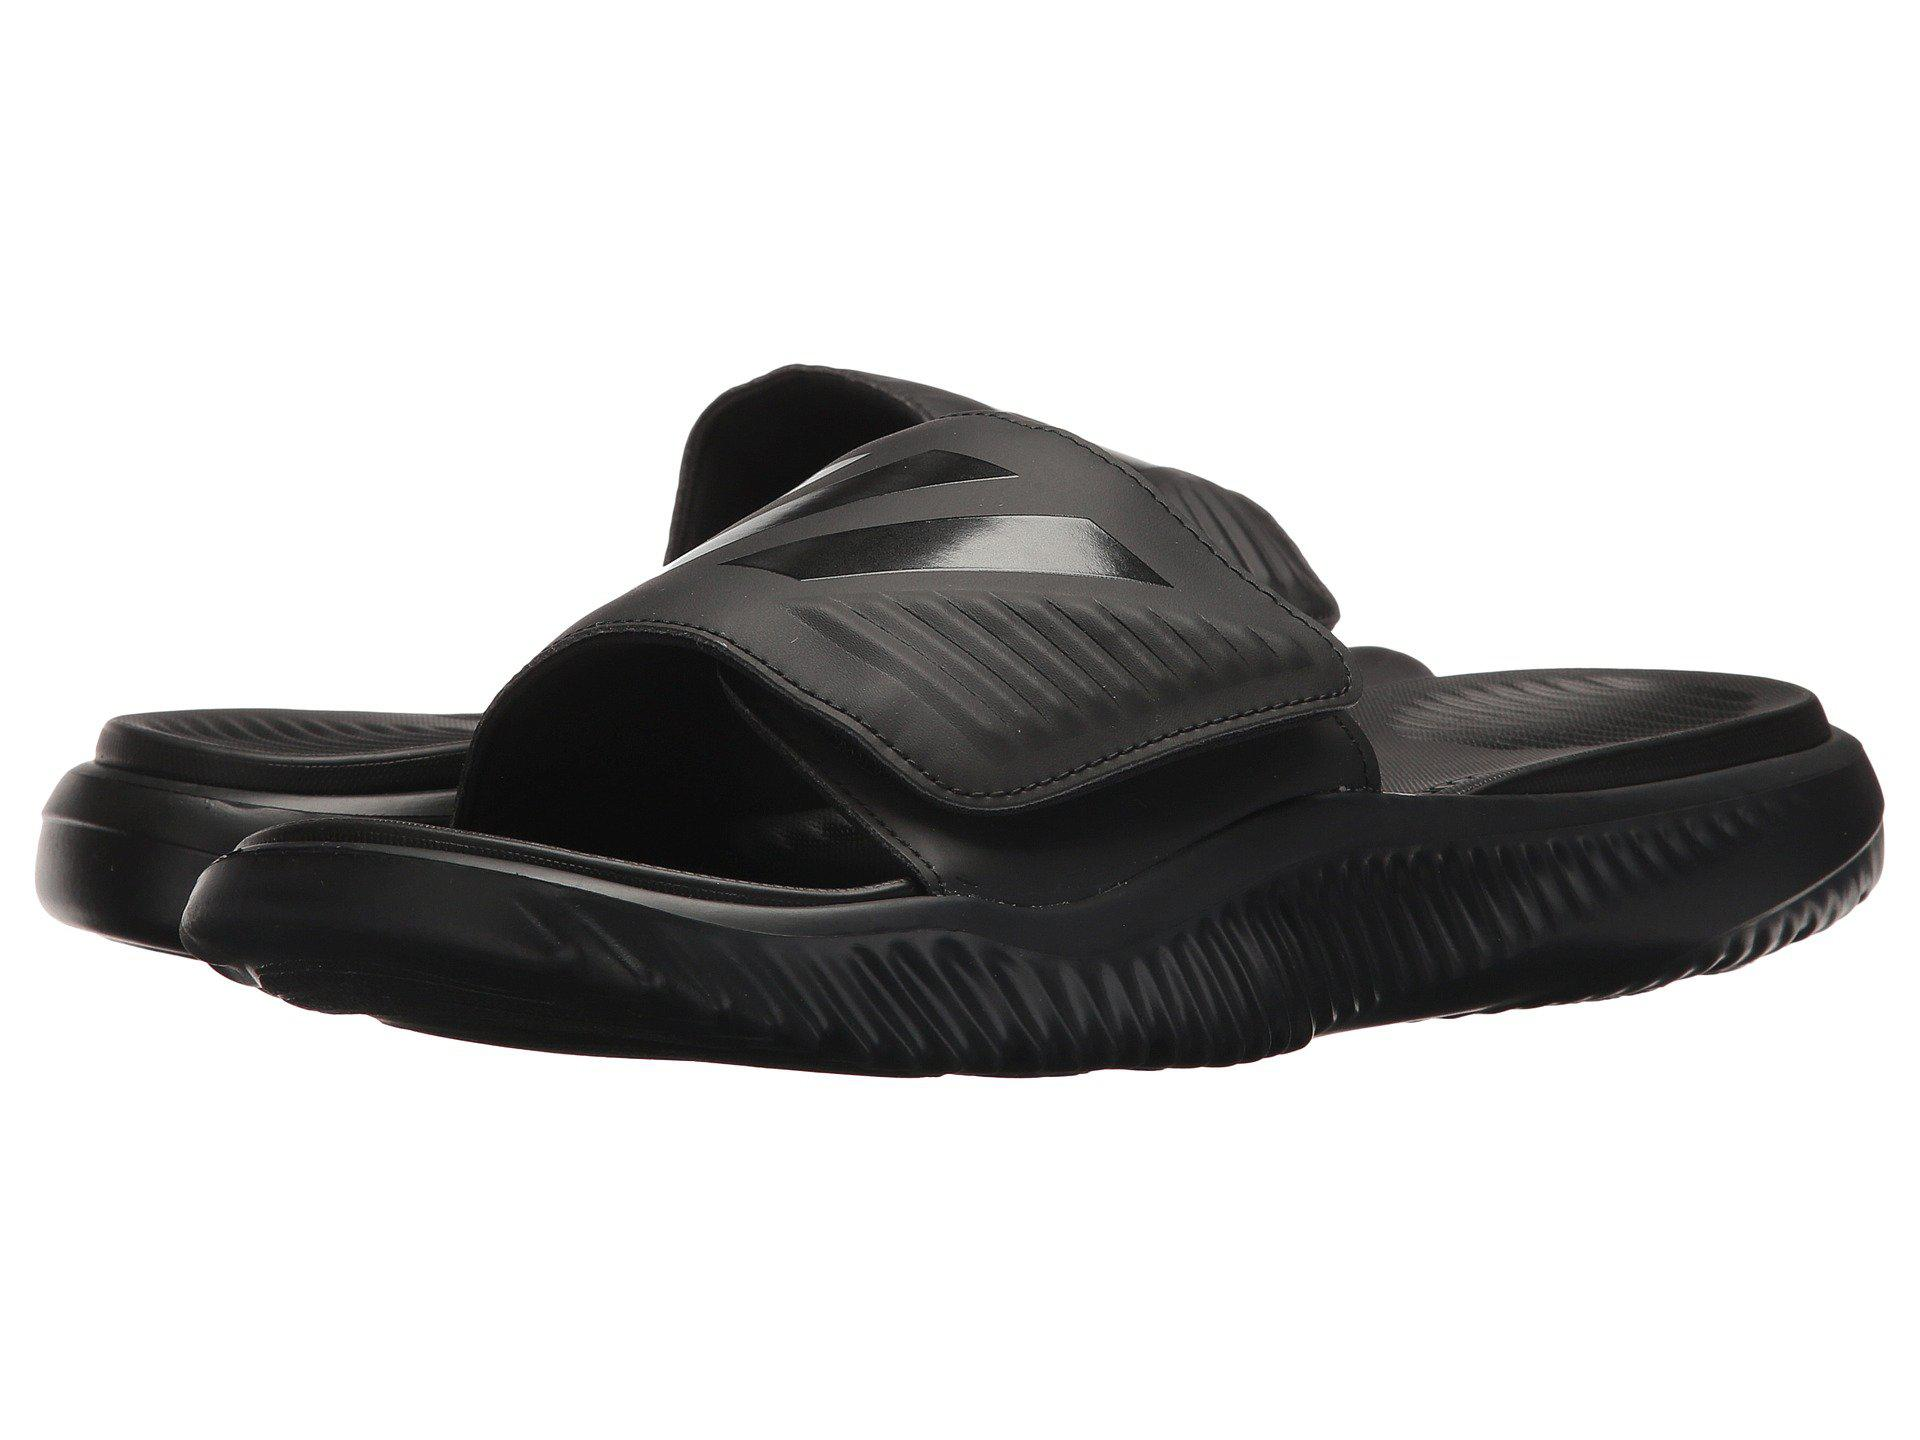 info for c55c0 72989 adidas. Alphabounce Slide ...